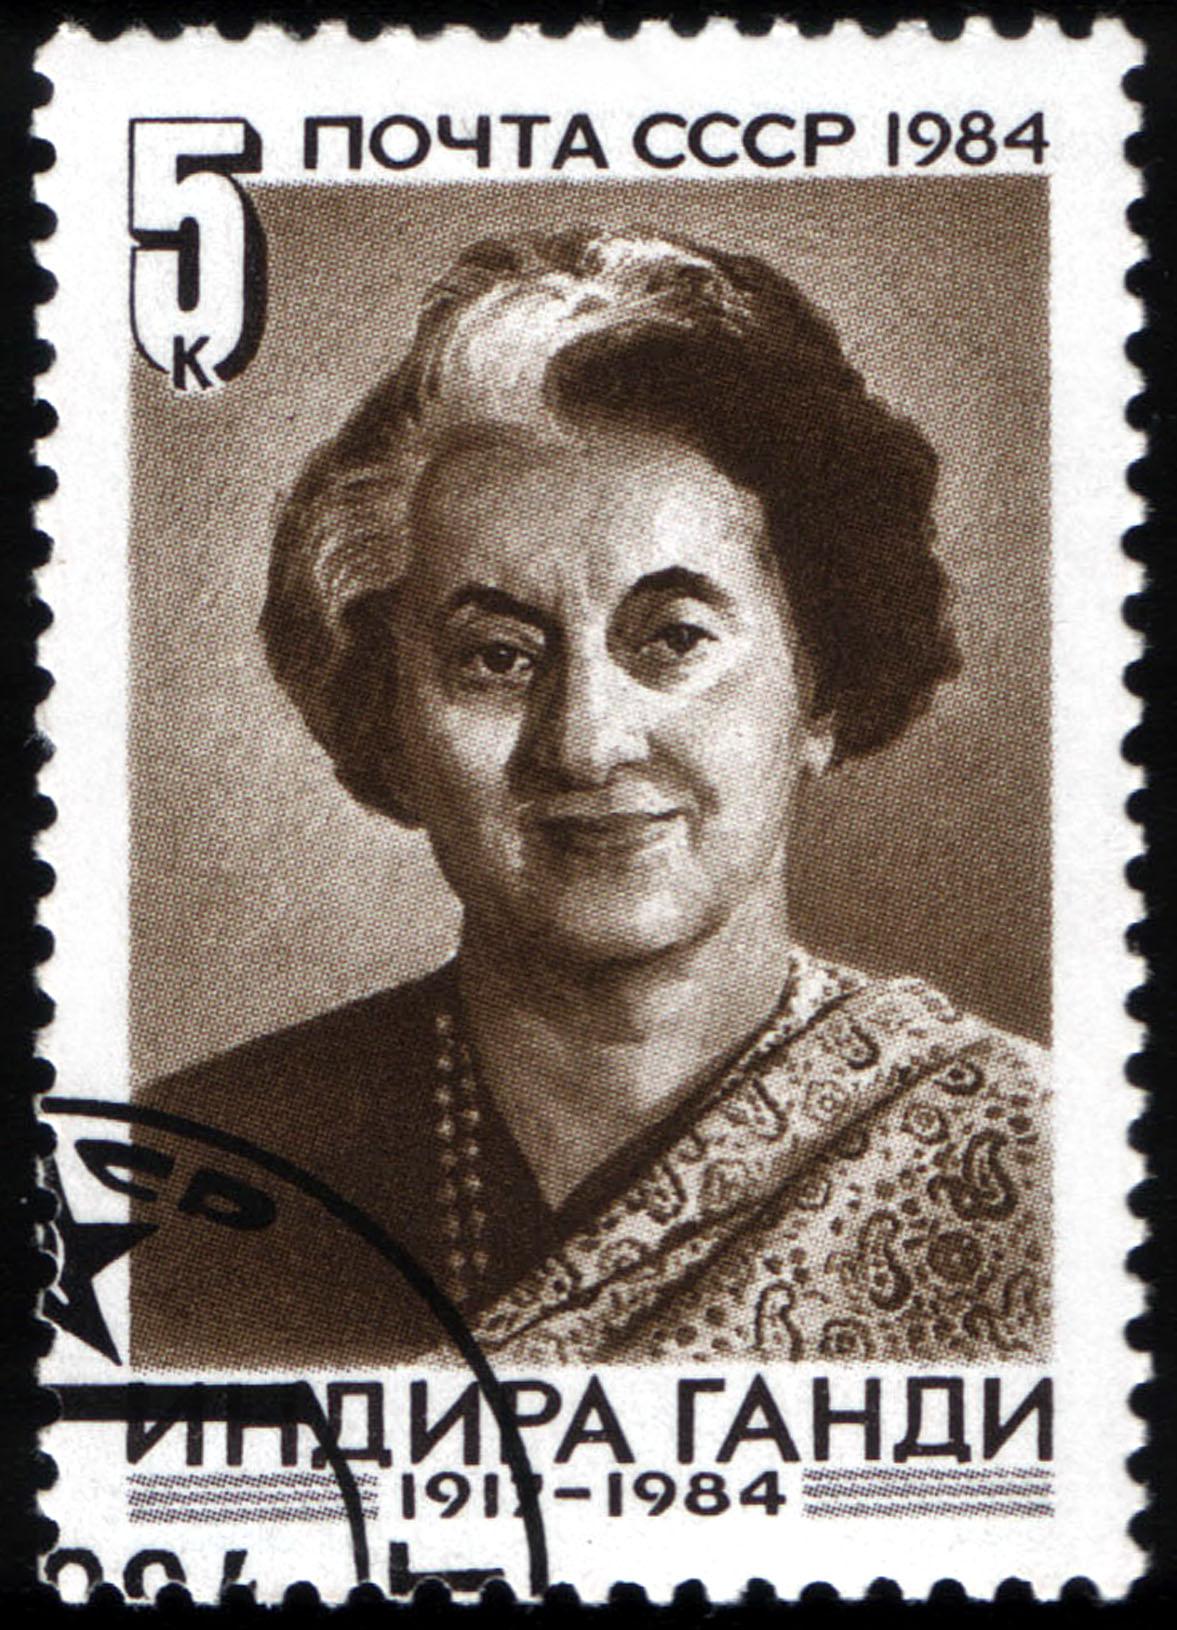 indira gandhi in hindi n prime minister indira indira gandhi in hindi indira gandhi auf einer sowjetischen briefmarke